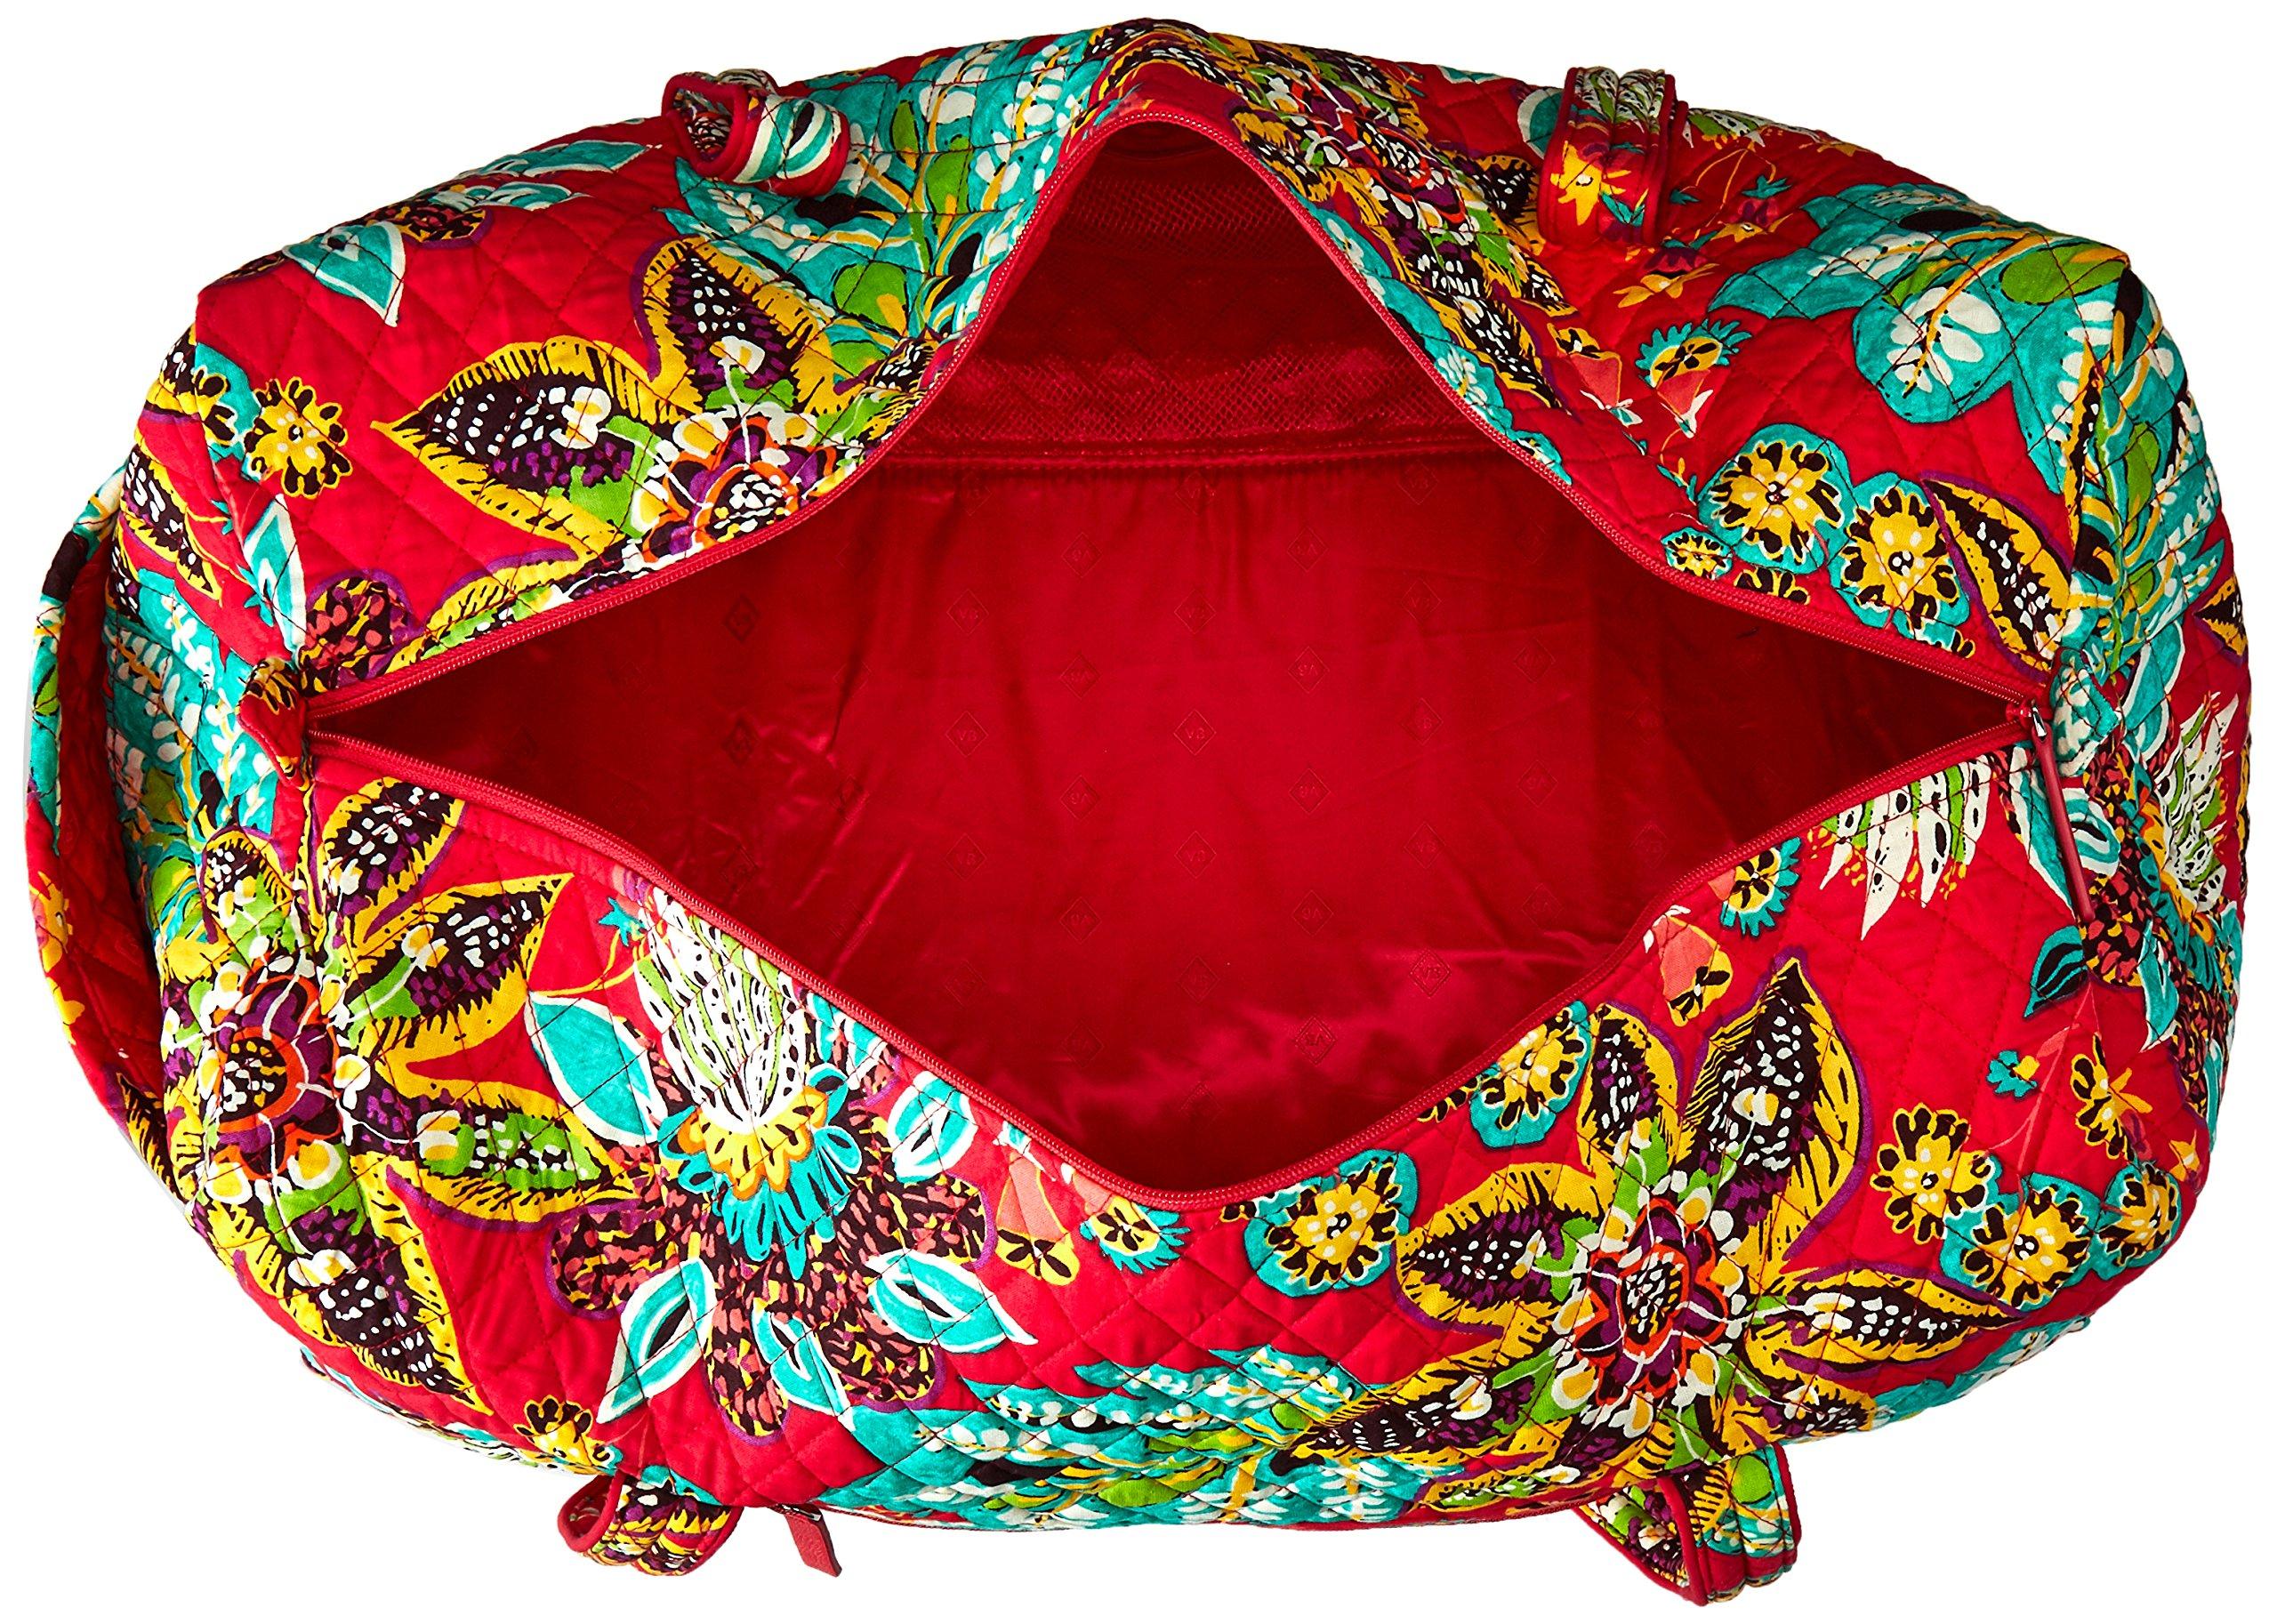 Women's Large Duffel, Signature Cotton, Rumba by Vera Bradley (Image #5)